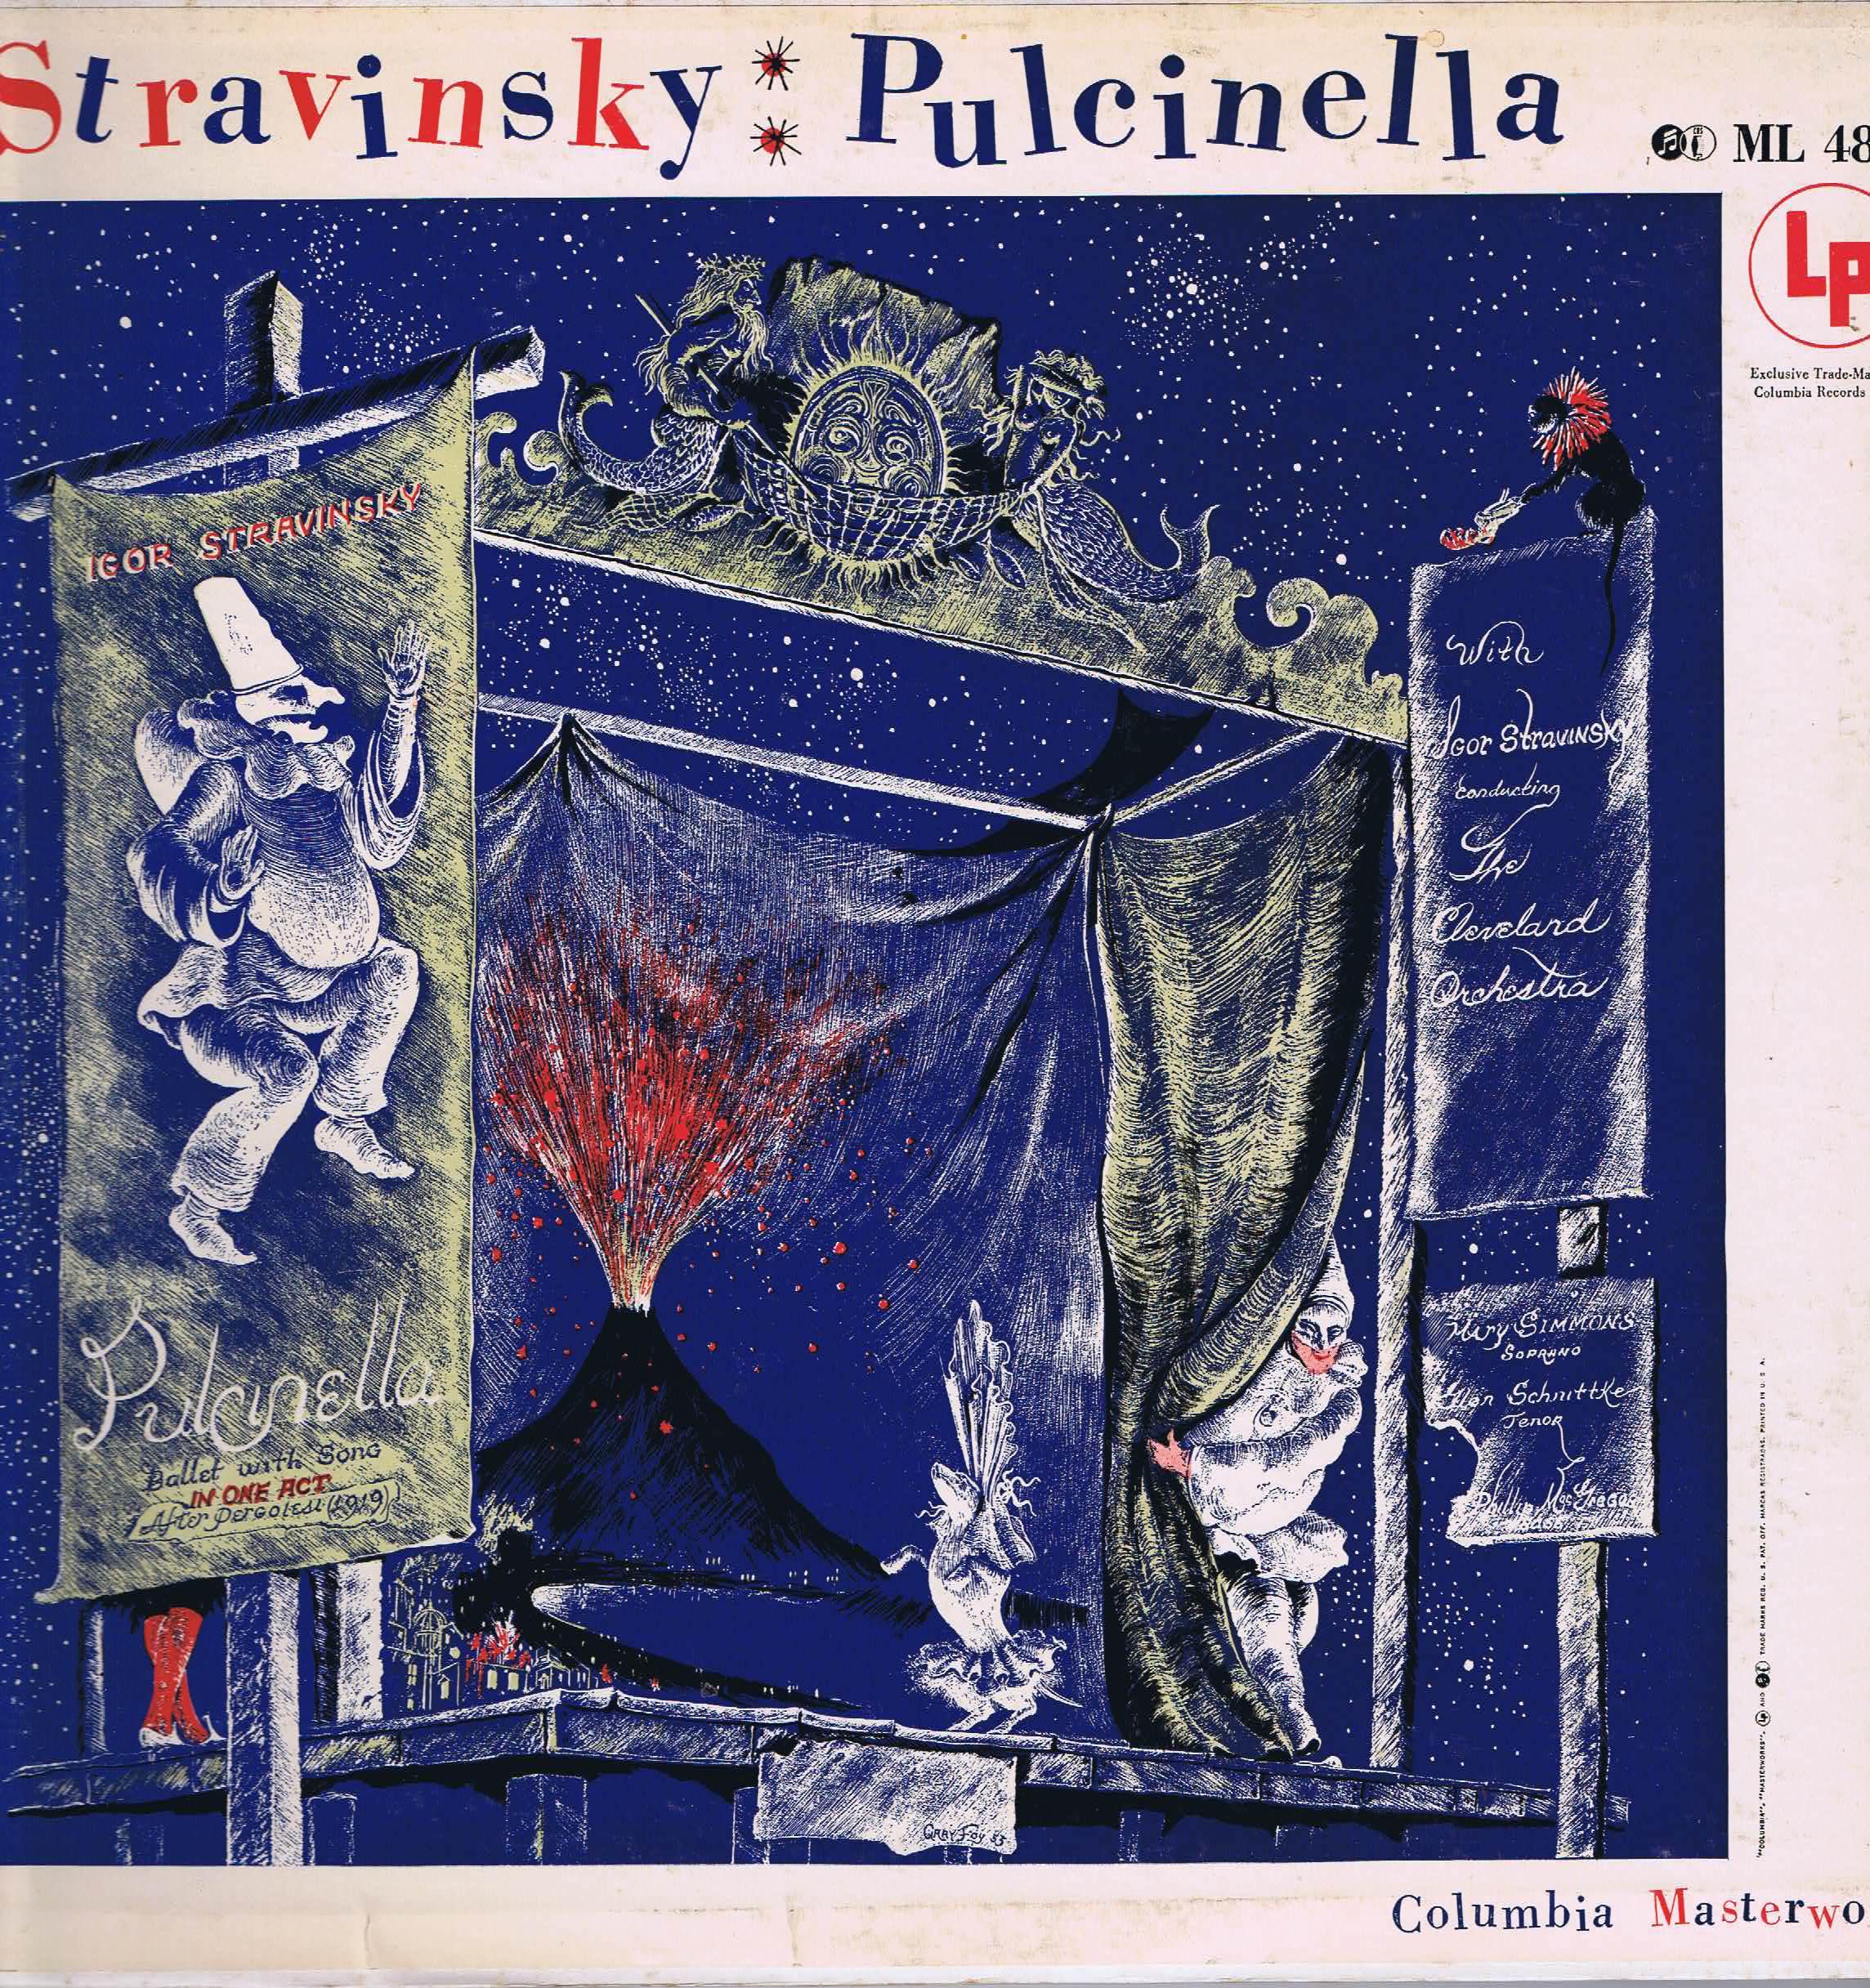 Columbia Ml 4830 Stravinsky Pulcinella Simmons